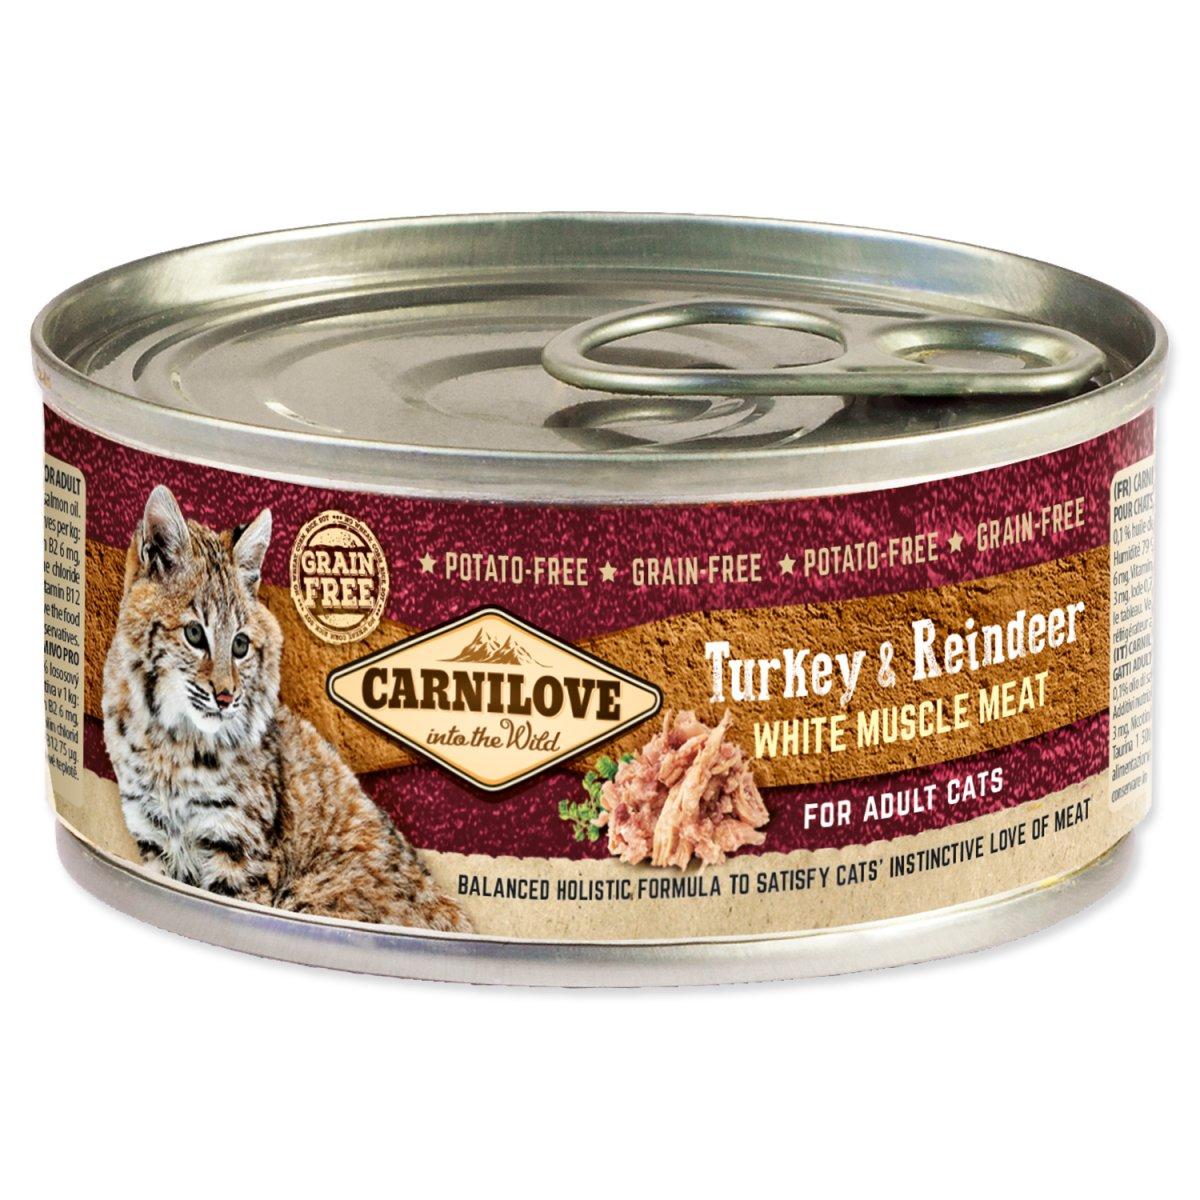 Konzerva CARNILOVE WMM Turkey & Reindeer for Adult Cats (100g)